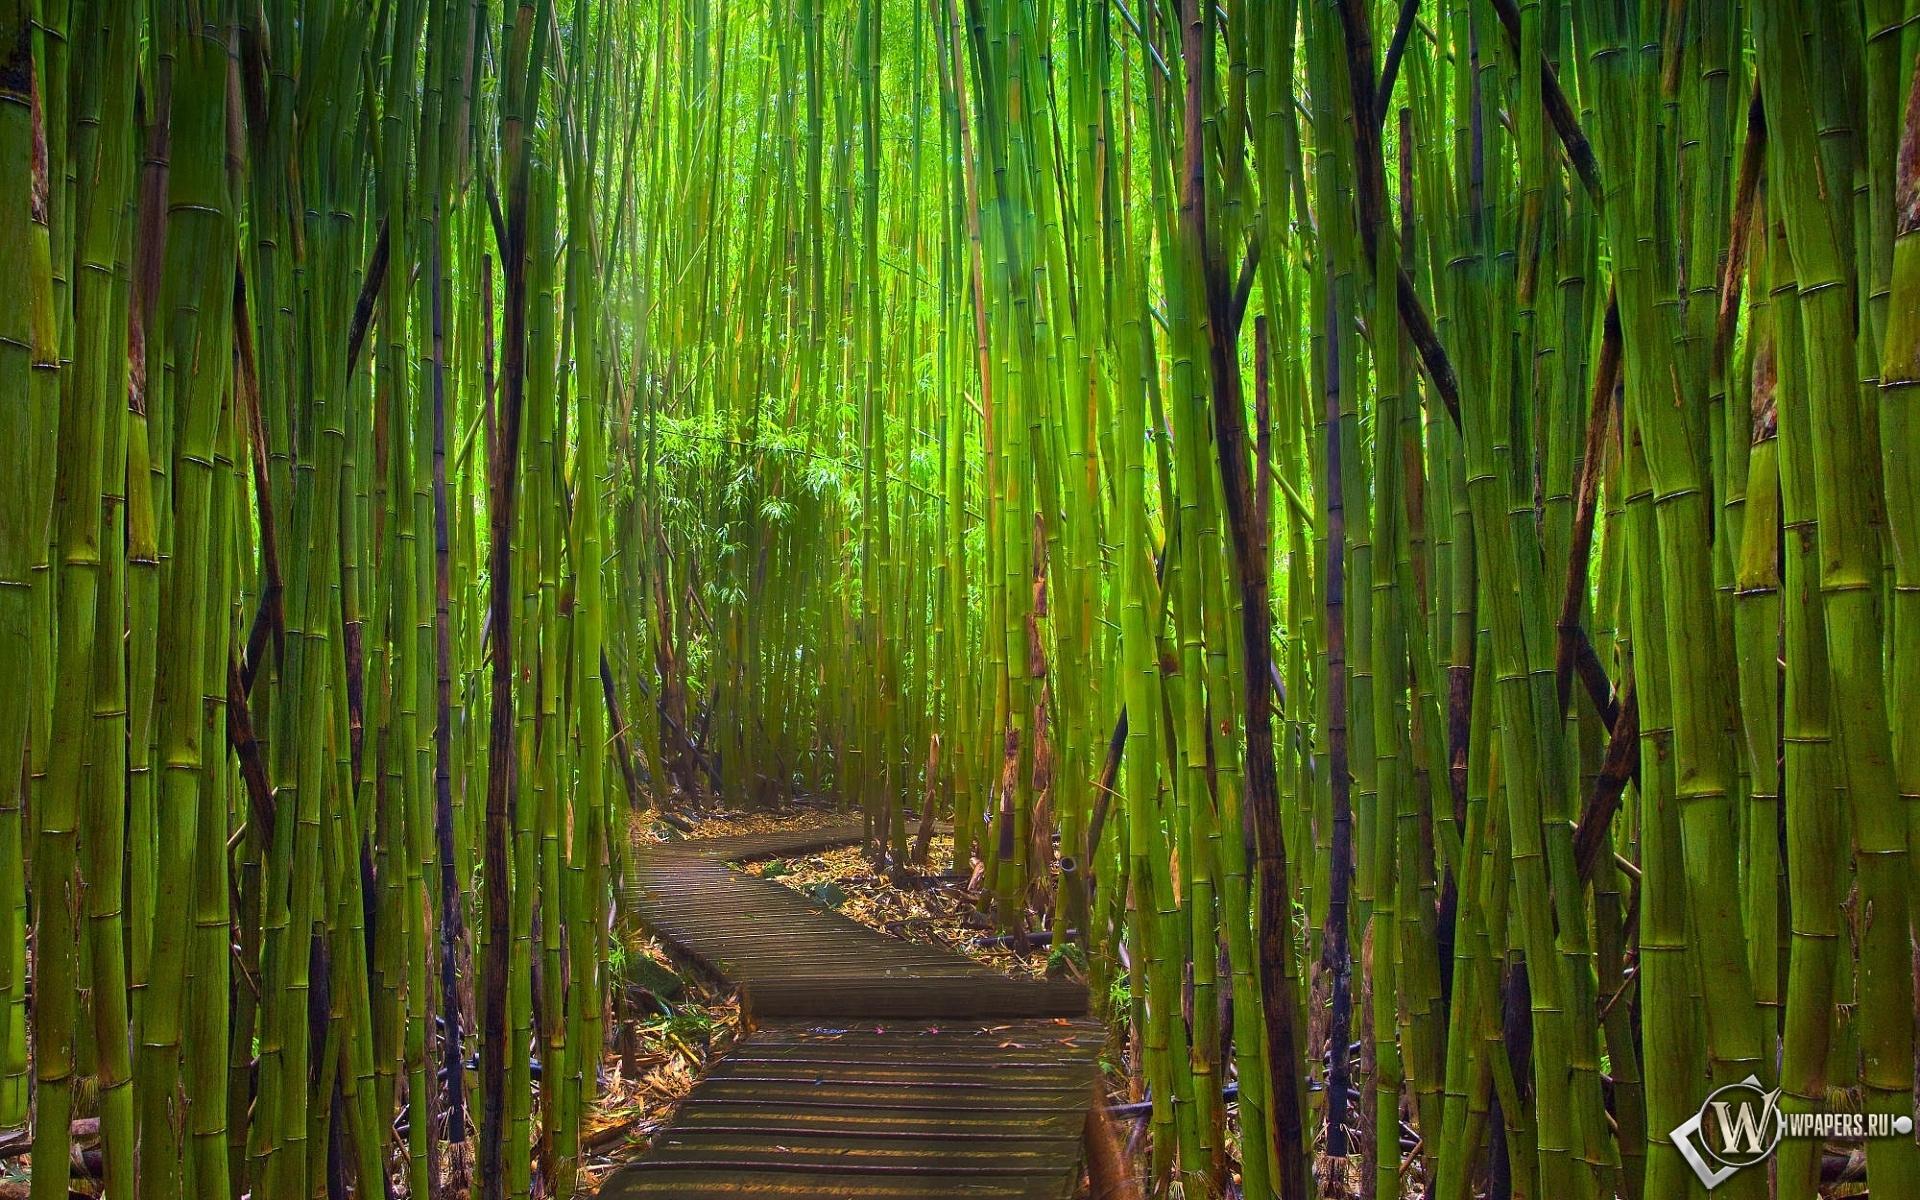 Бамбуковый лес Киото Япония 1920x1200